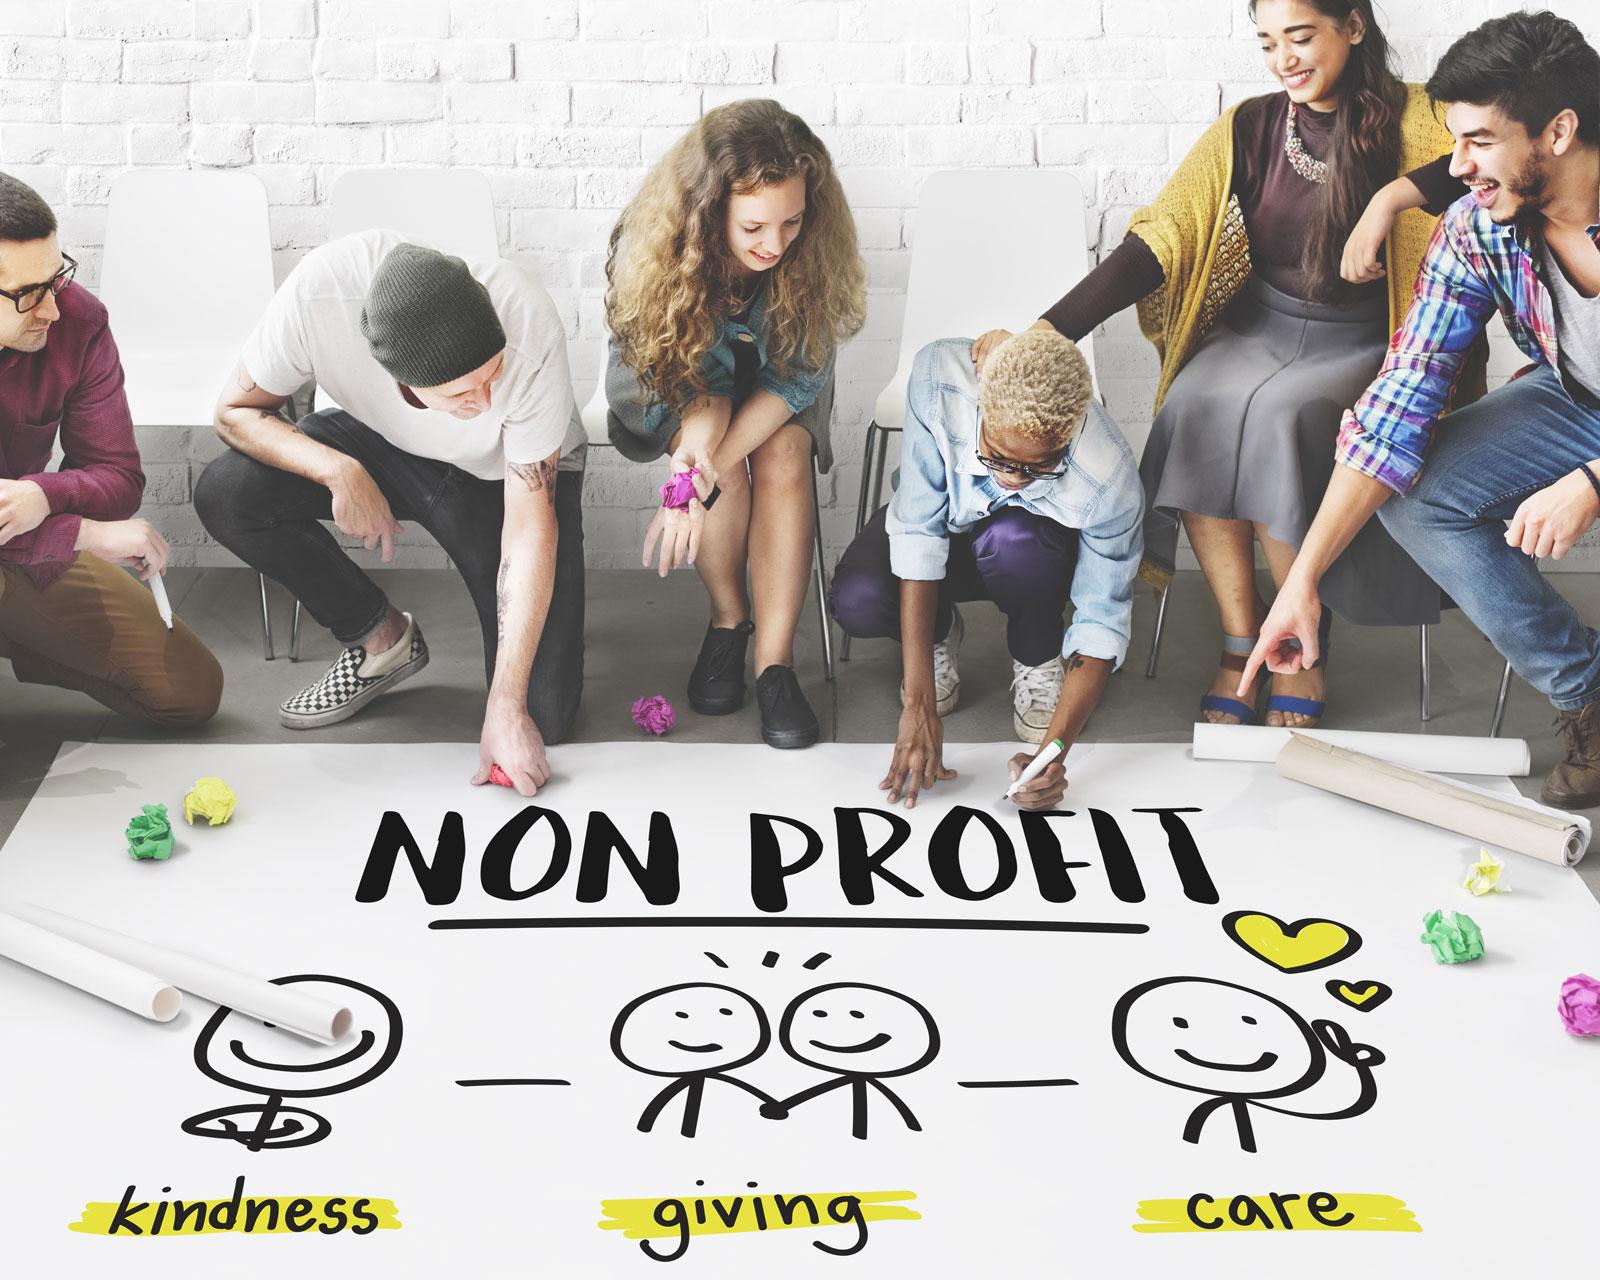 nonprofits-working-background.jpg